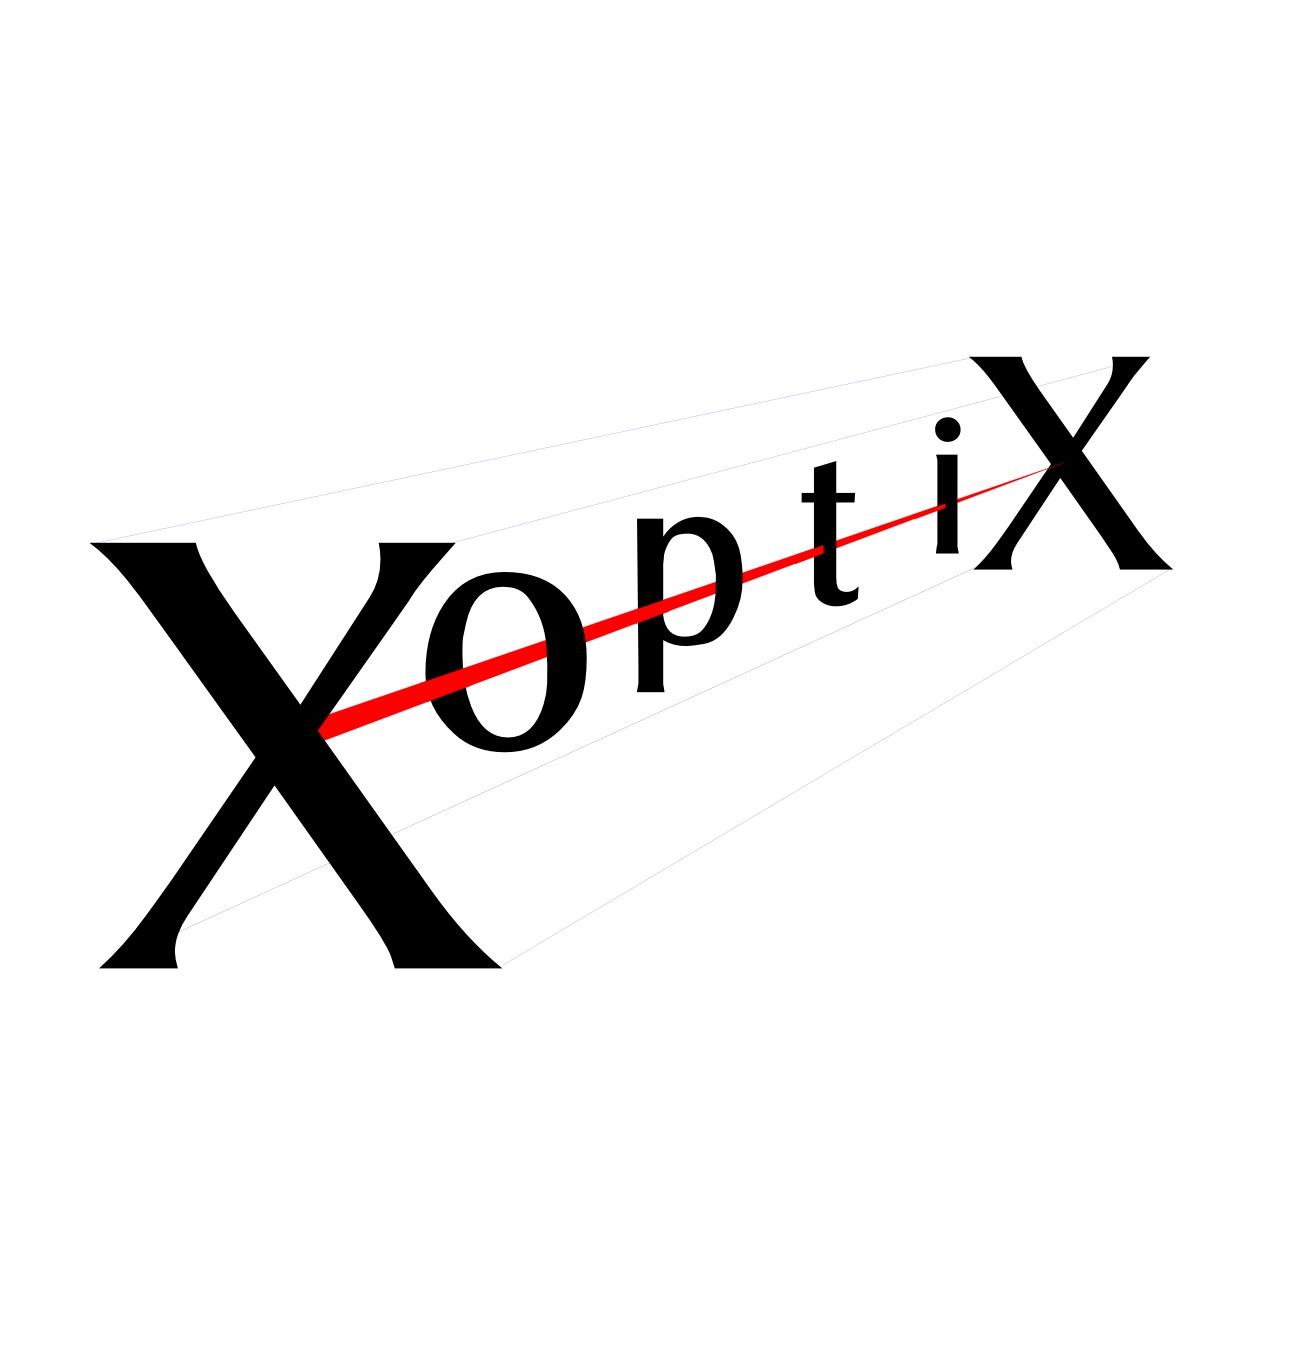 Xoptix To Present At Cemtech Asia Xoptix